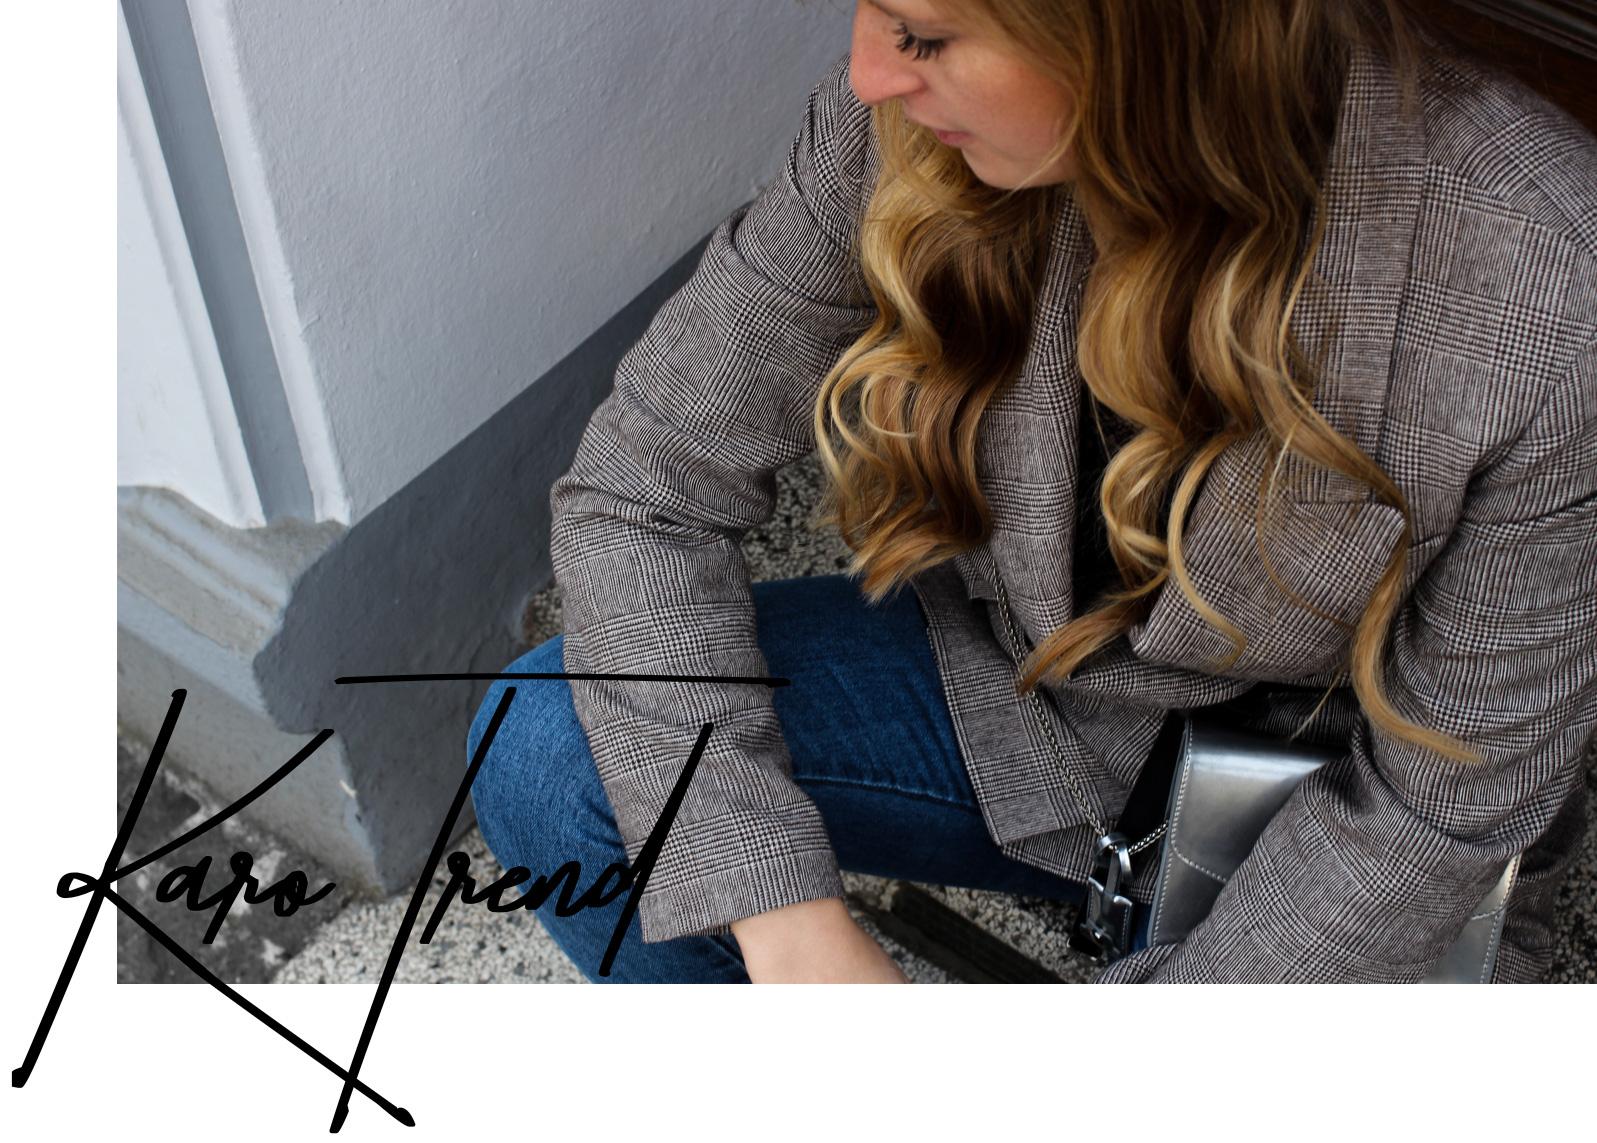 Frühlingstrend 2018 Karomuster Kombinationstipps Modeblog Karo kombinieren Outfit karrierter Blazer Fashion Blogger